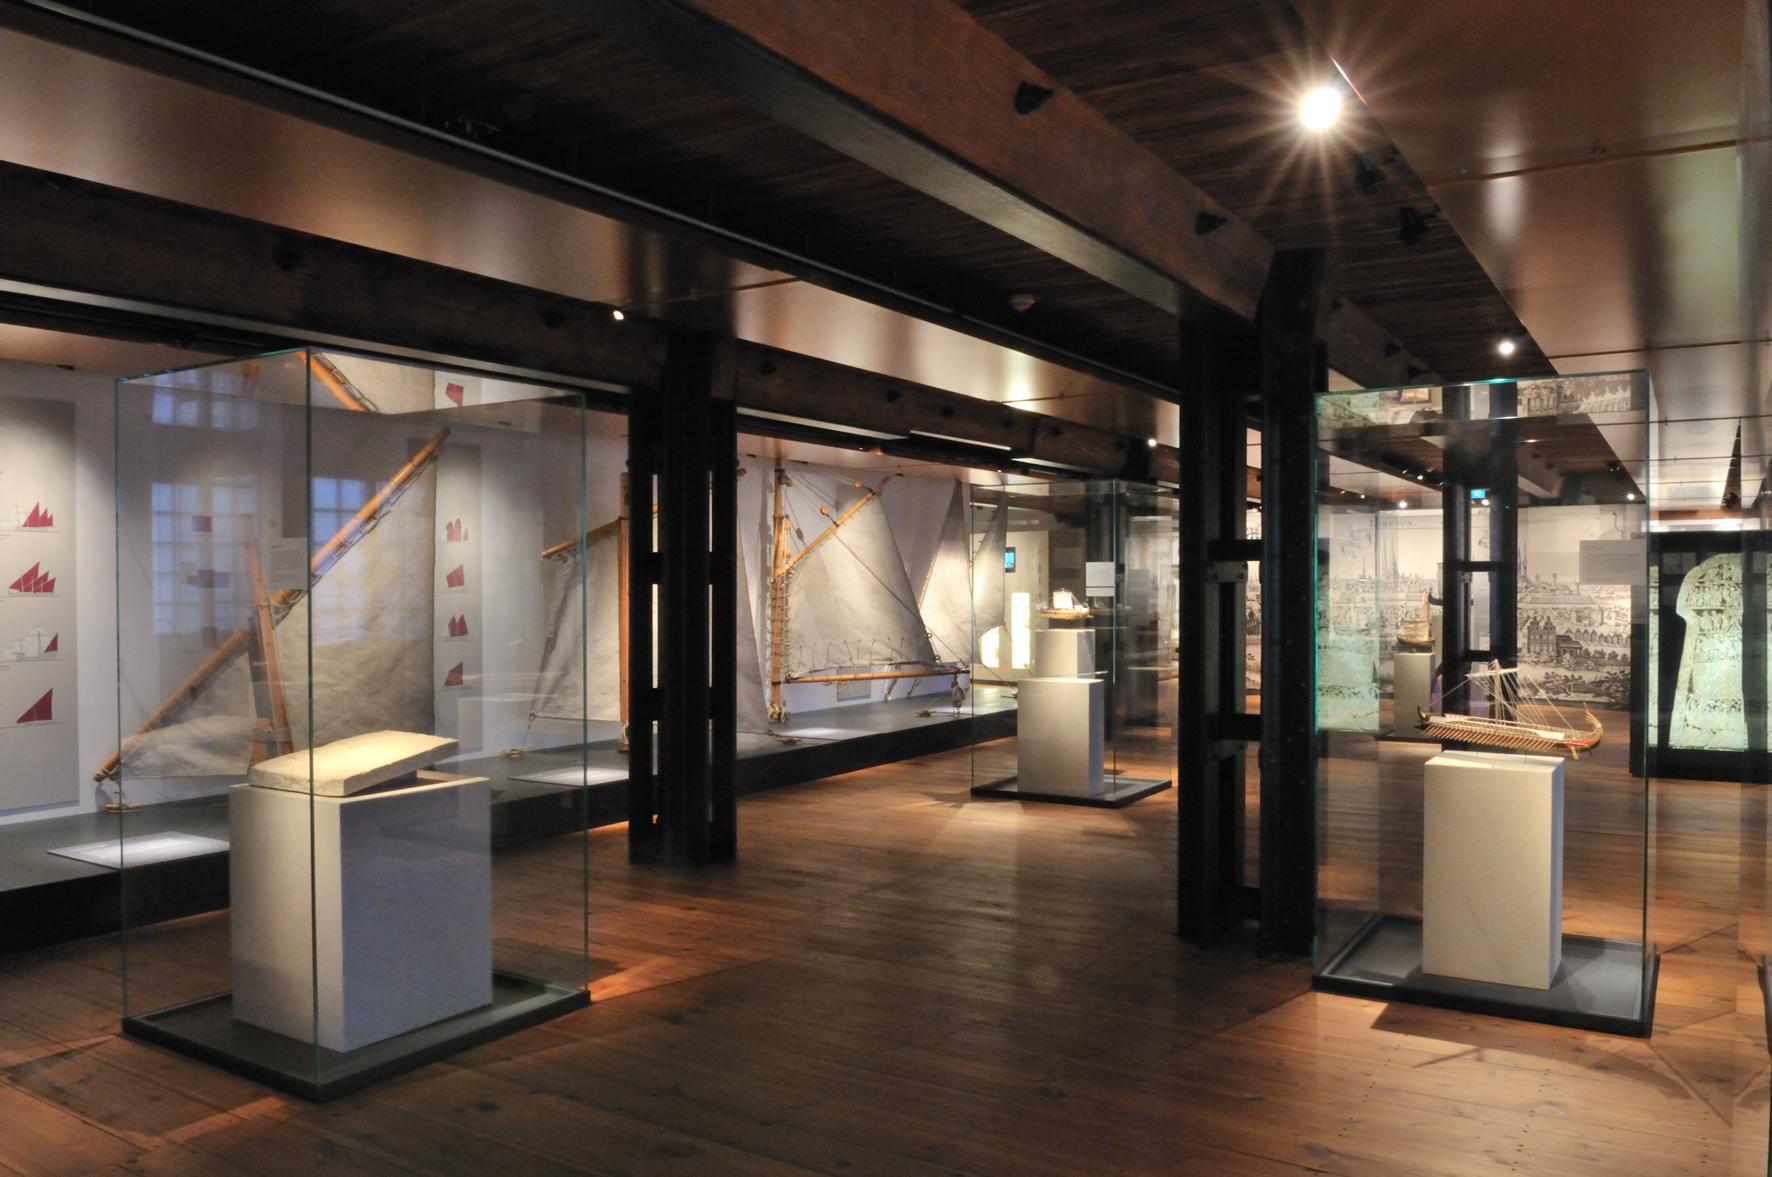 08.kwod_Ausstellung_Internationales_Maritimes_Museum_Takelage